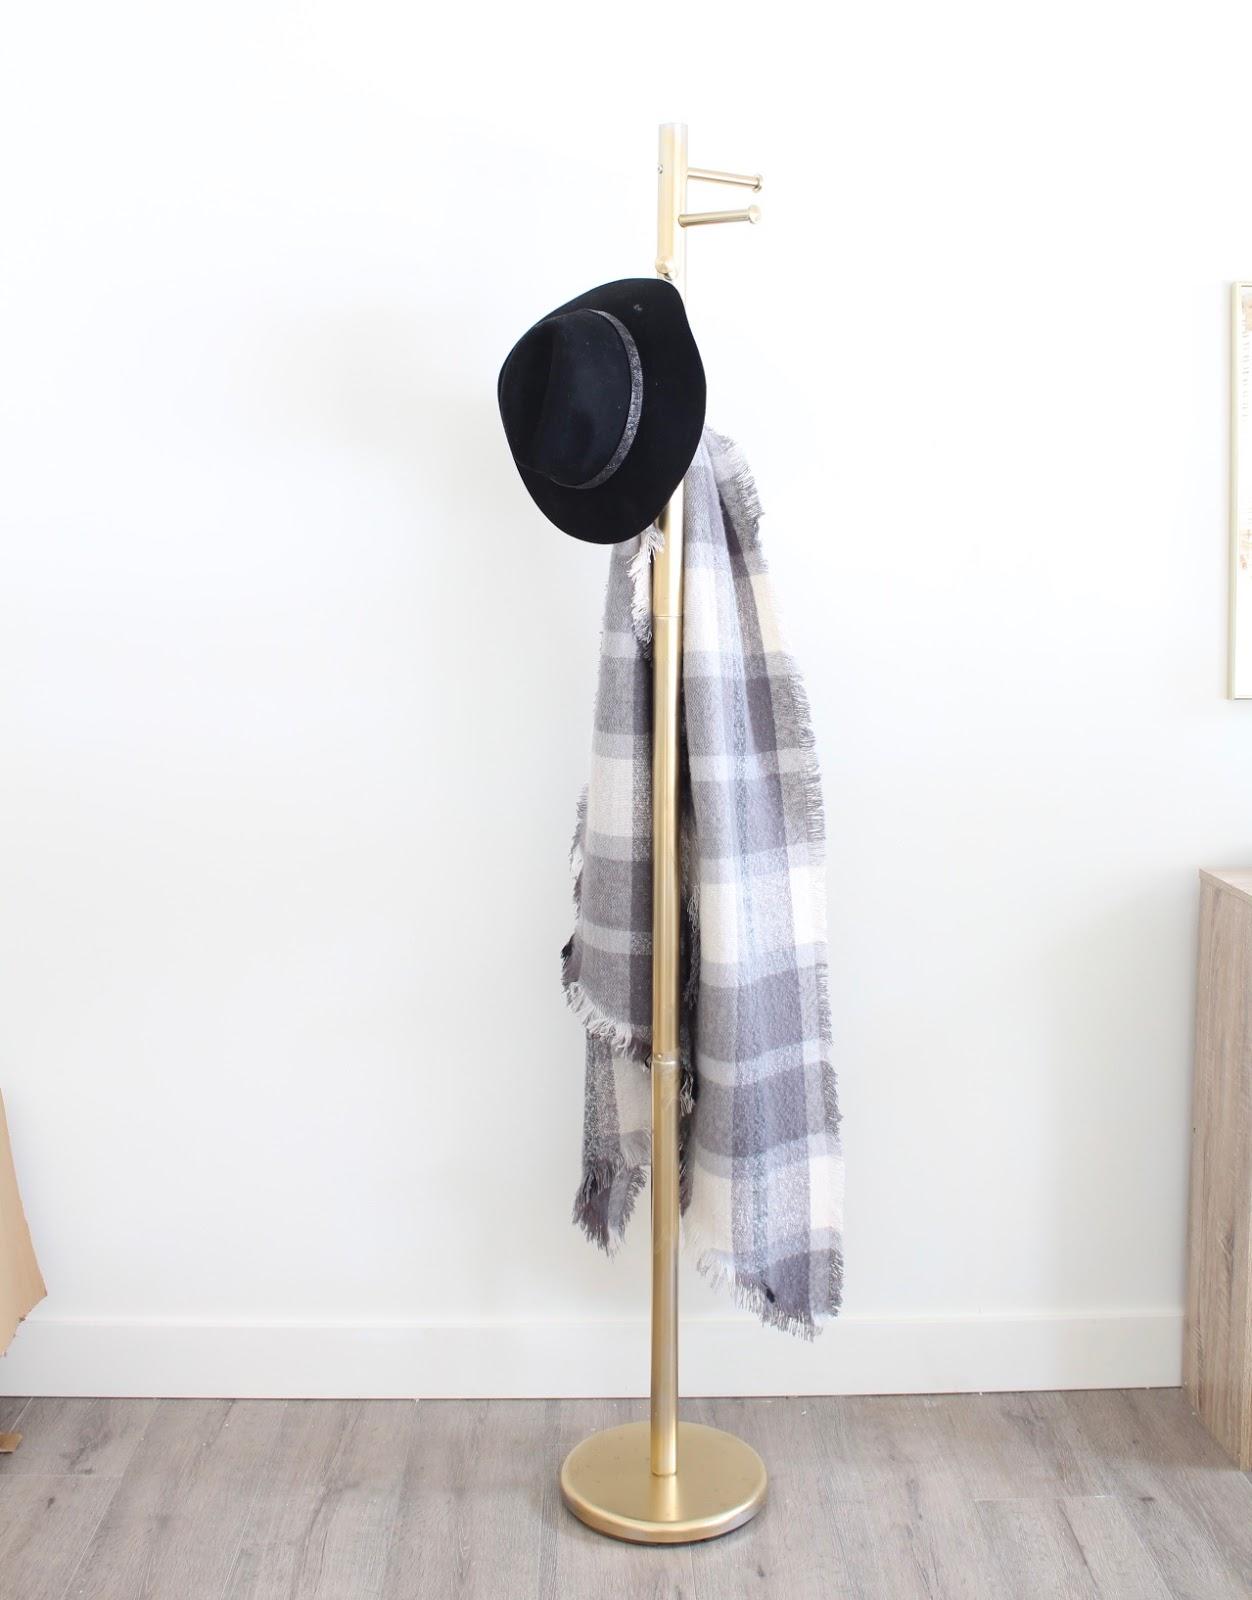 Entryway Organization Tips 1 Coat Rack